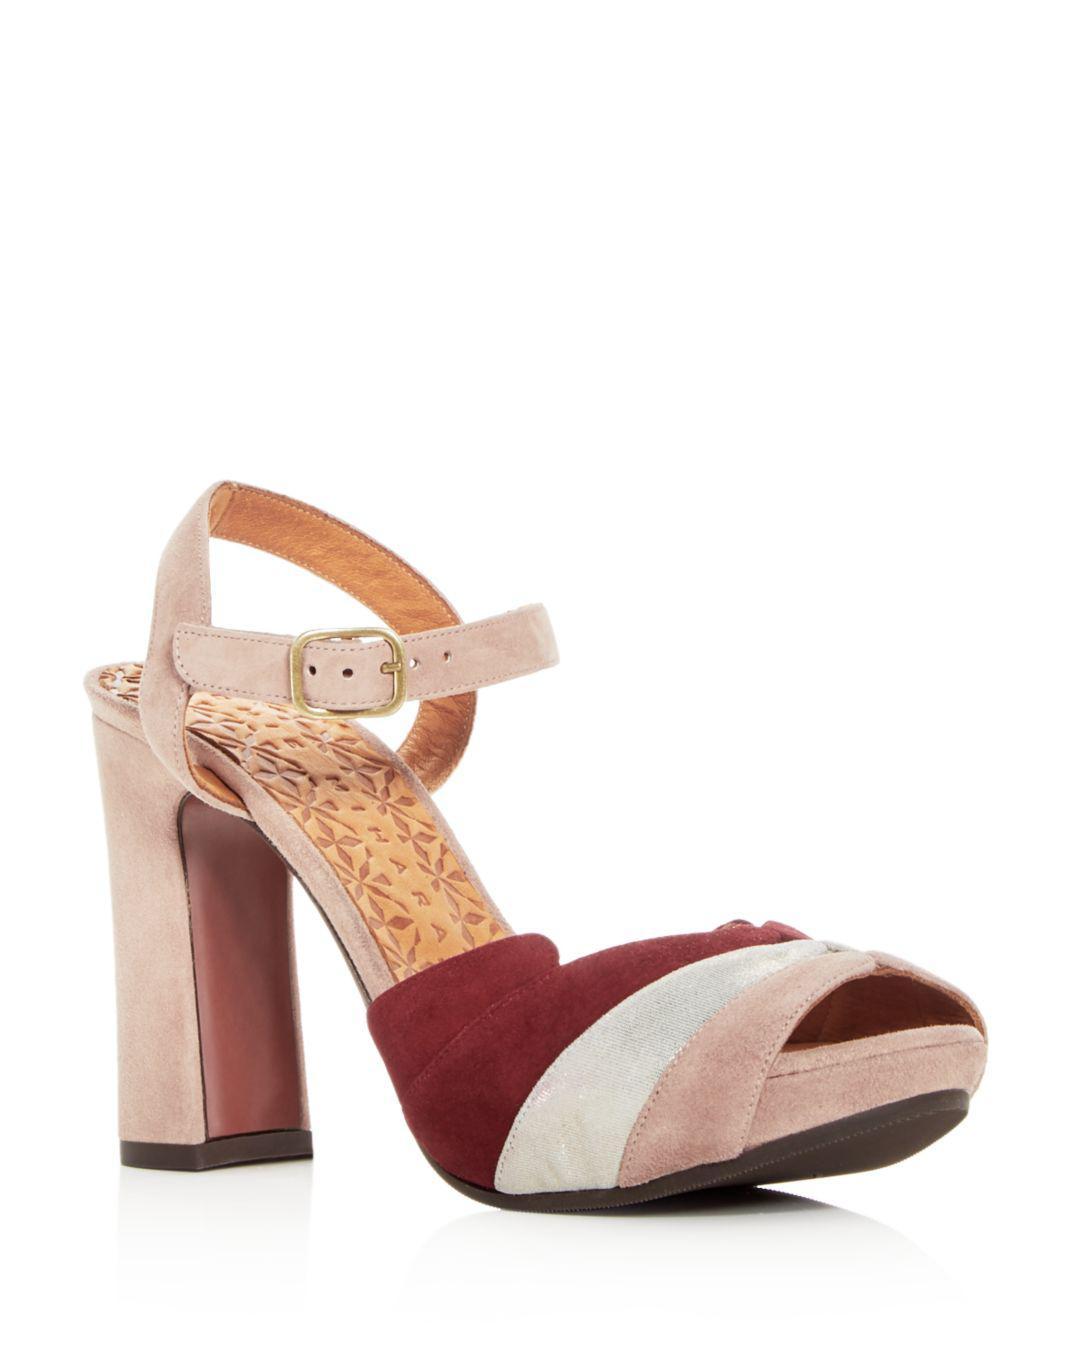 38846568f3d Lyst - Chie Mihara Women s Candel Suede High Block Heel Platform Sandals